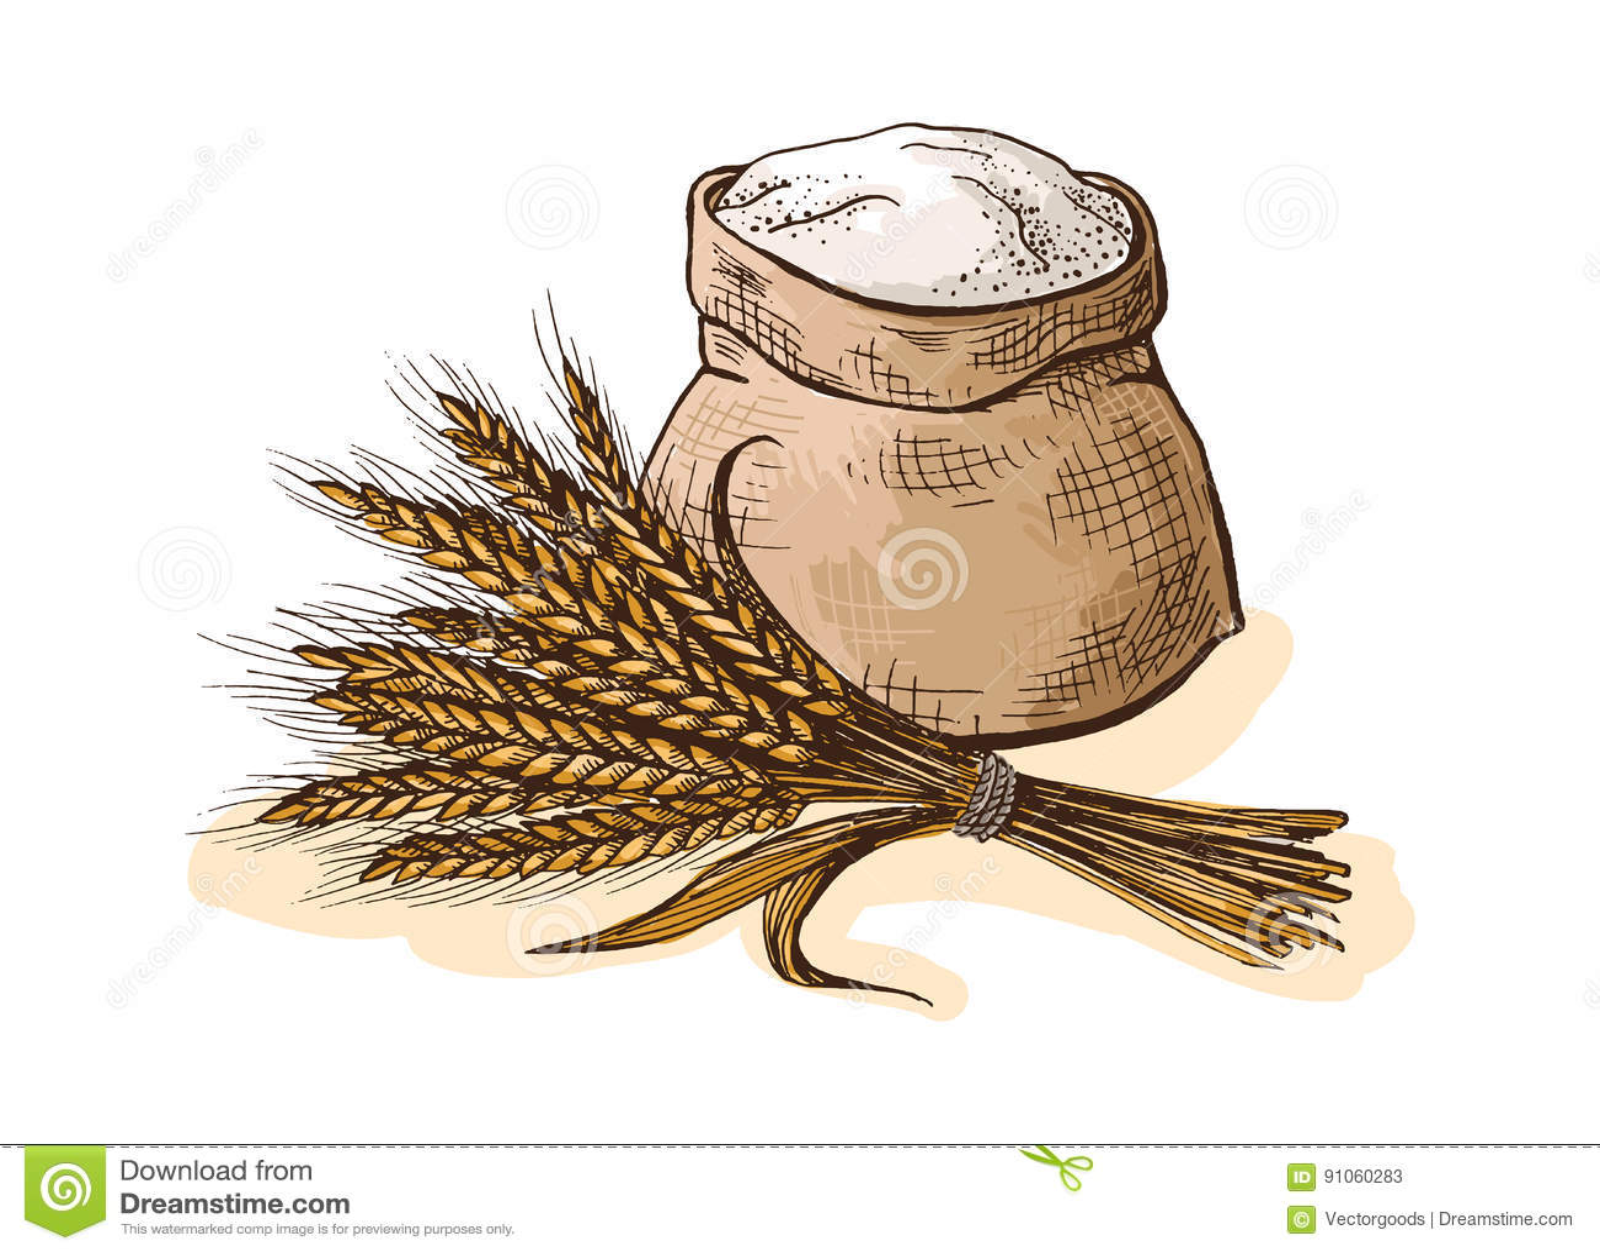 harina dibujo www imgkid com the image kid has it ear of corn clipart ear of corn clip art black and white